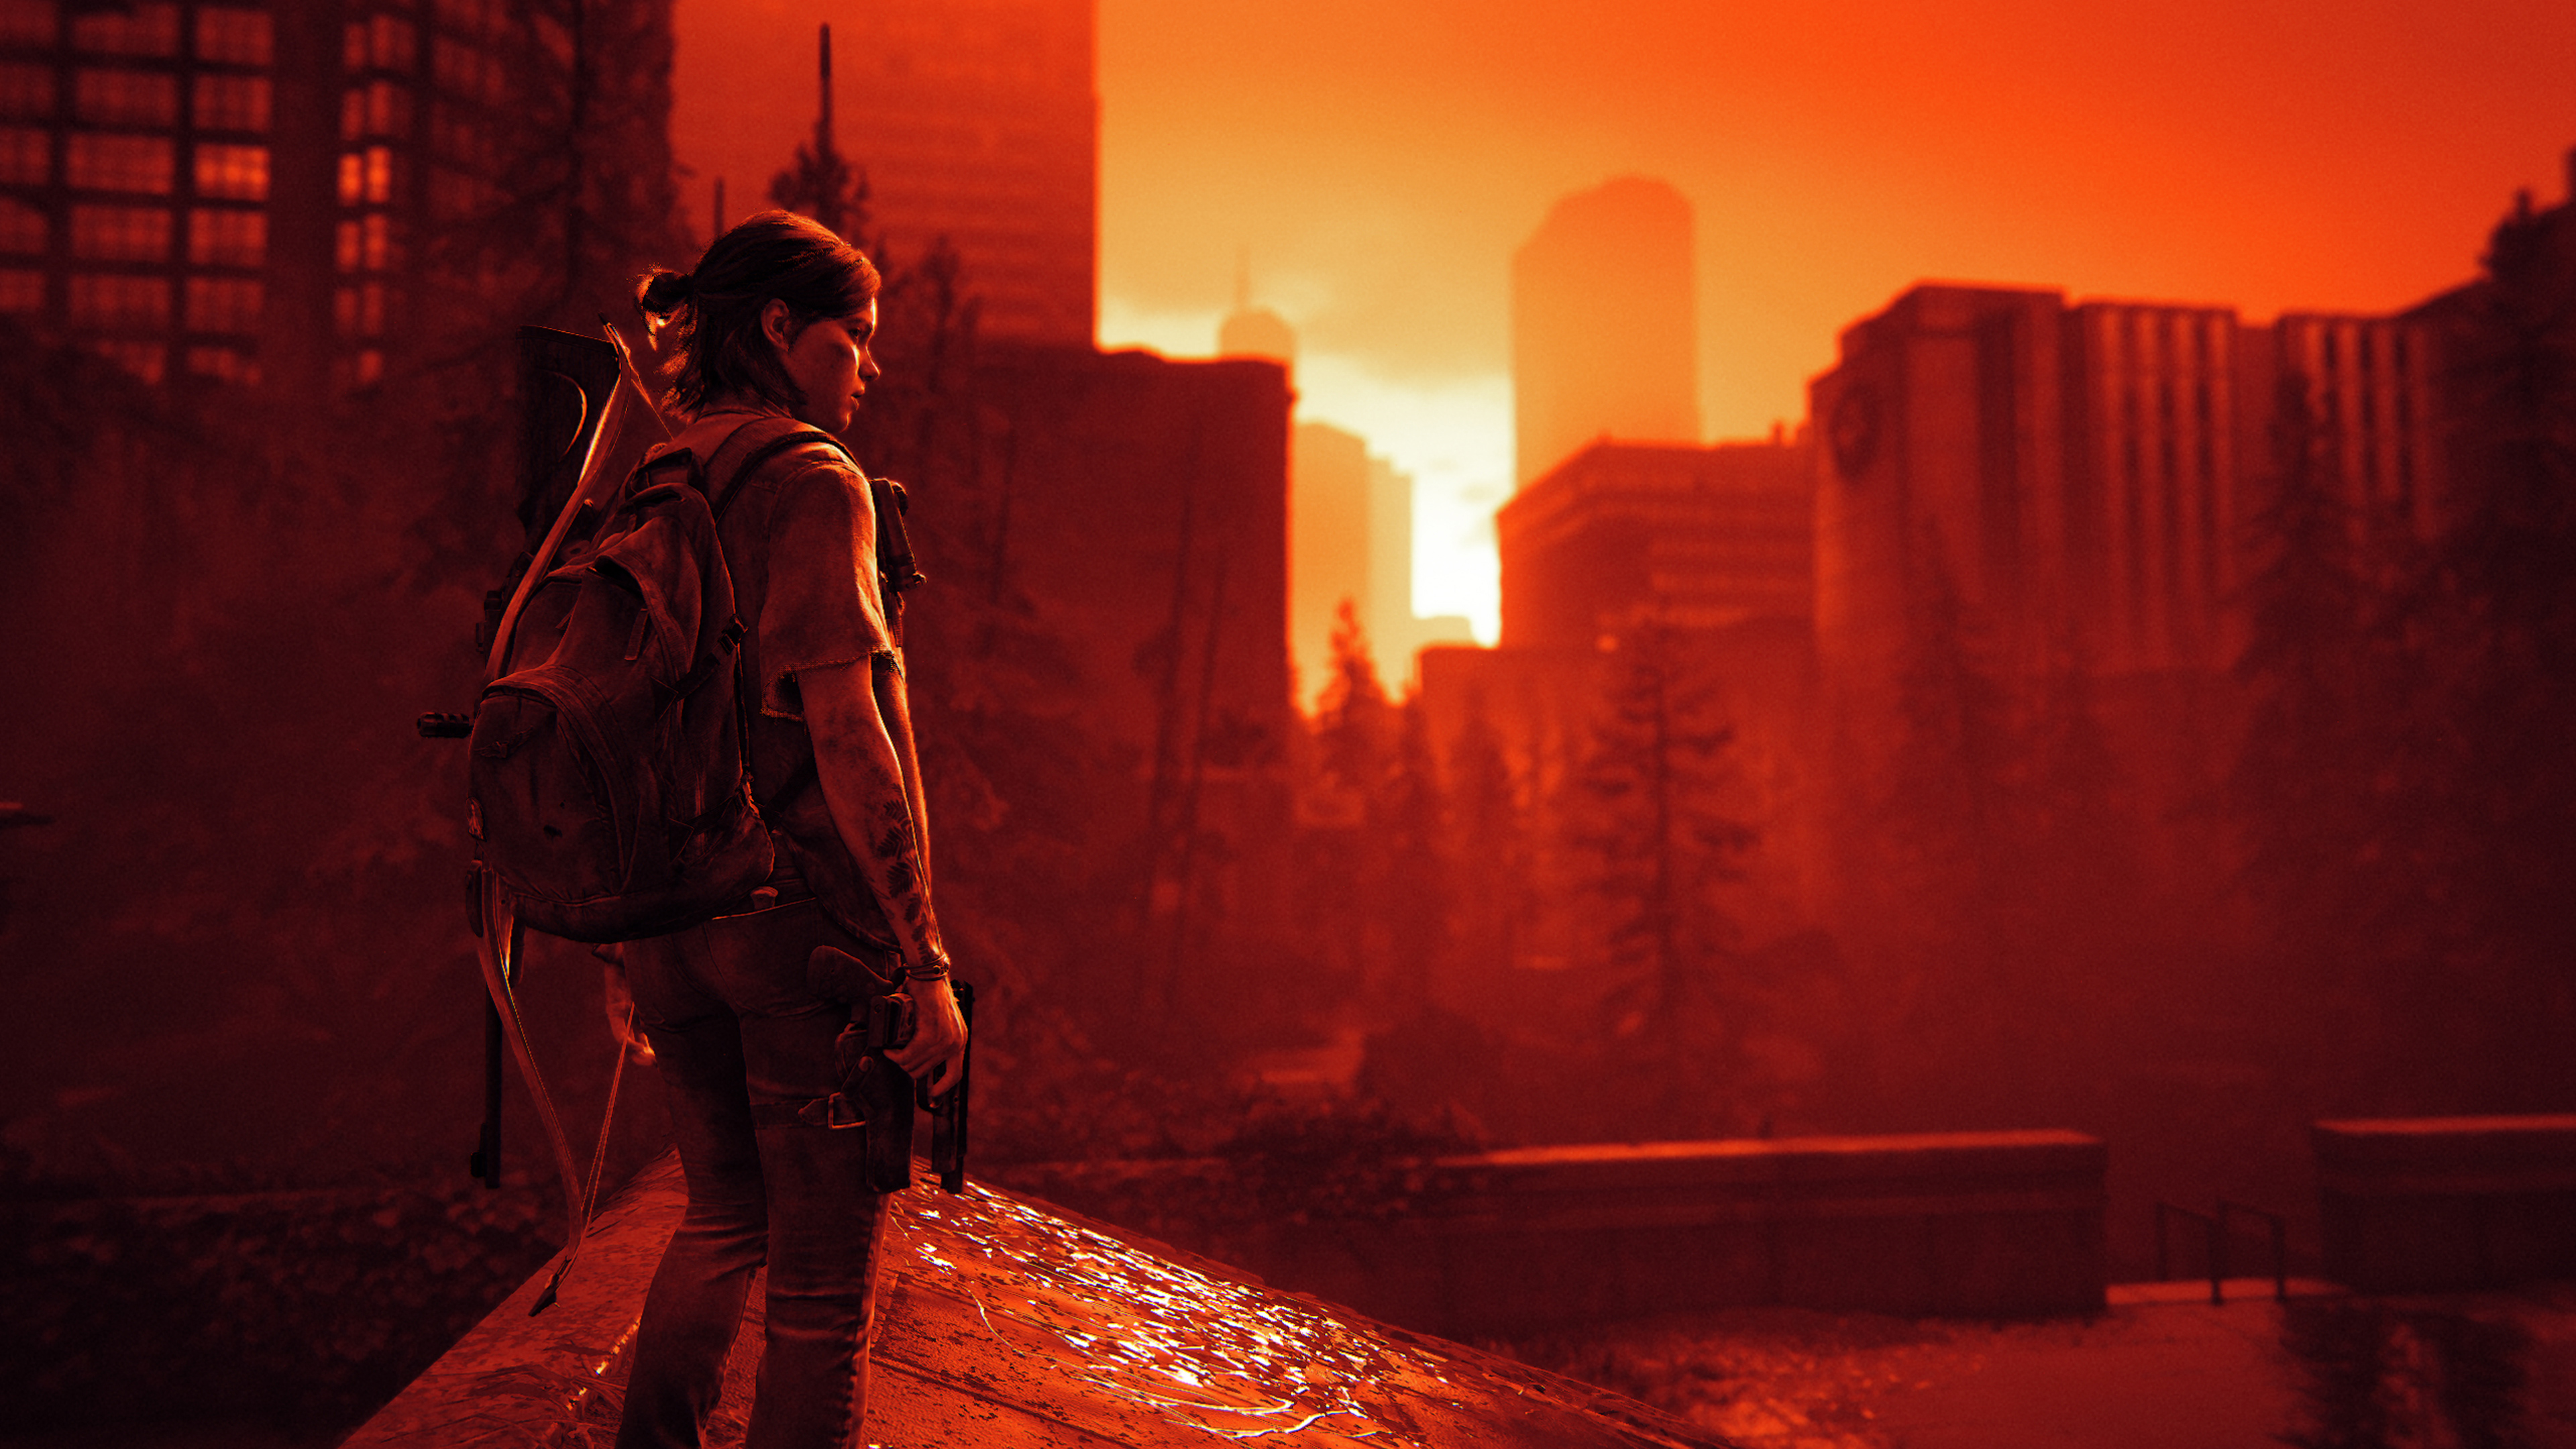 The Last Of Us Part II 4k 2020 The Last Of Us Part II 4k ...